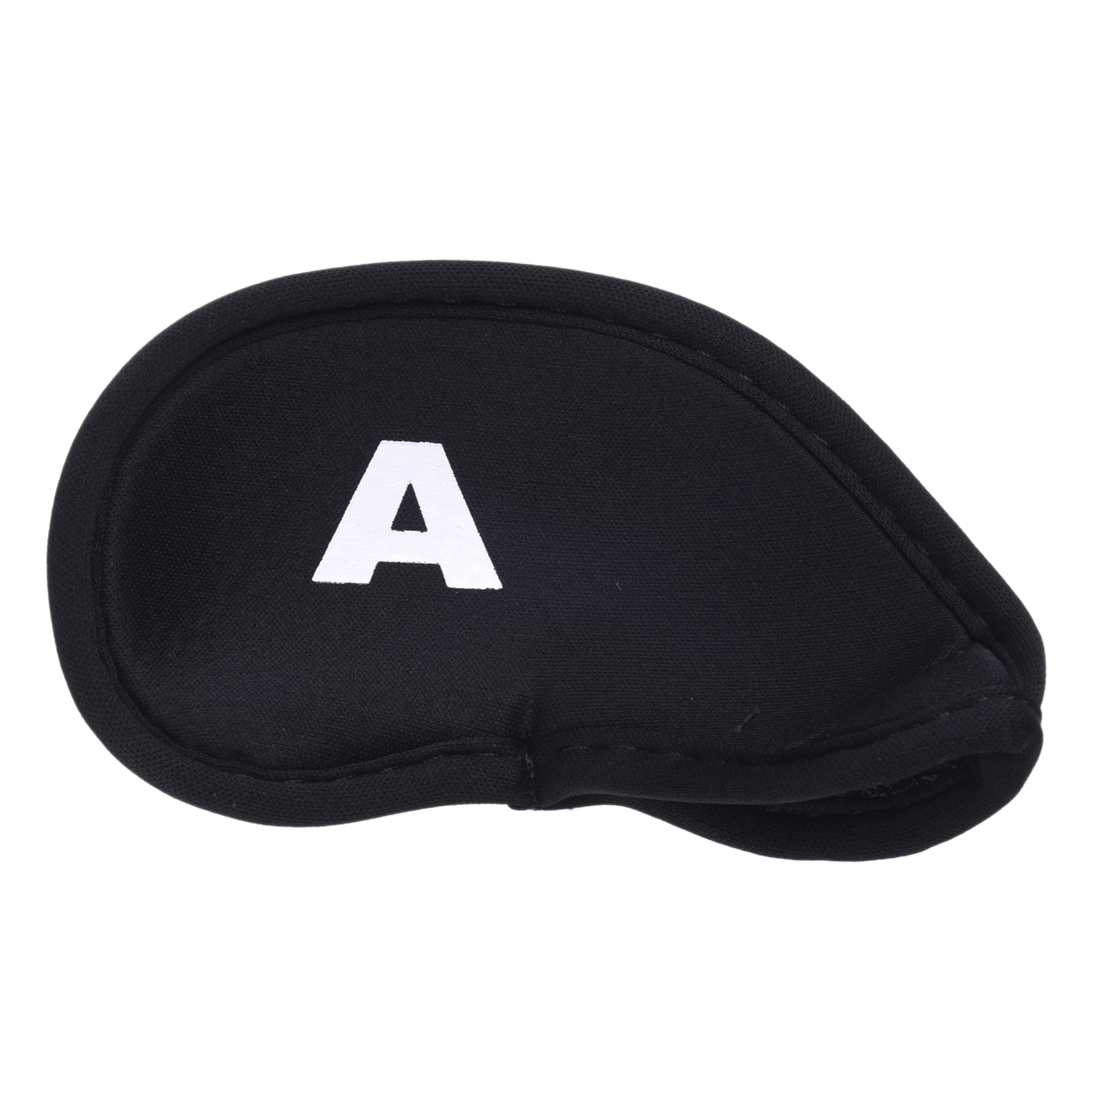 10pcs Golf Head Cover Club Iron Putter Head Protector Set Neoprene Black